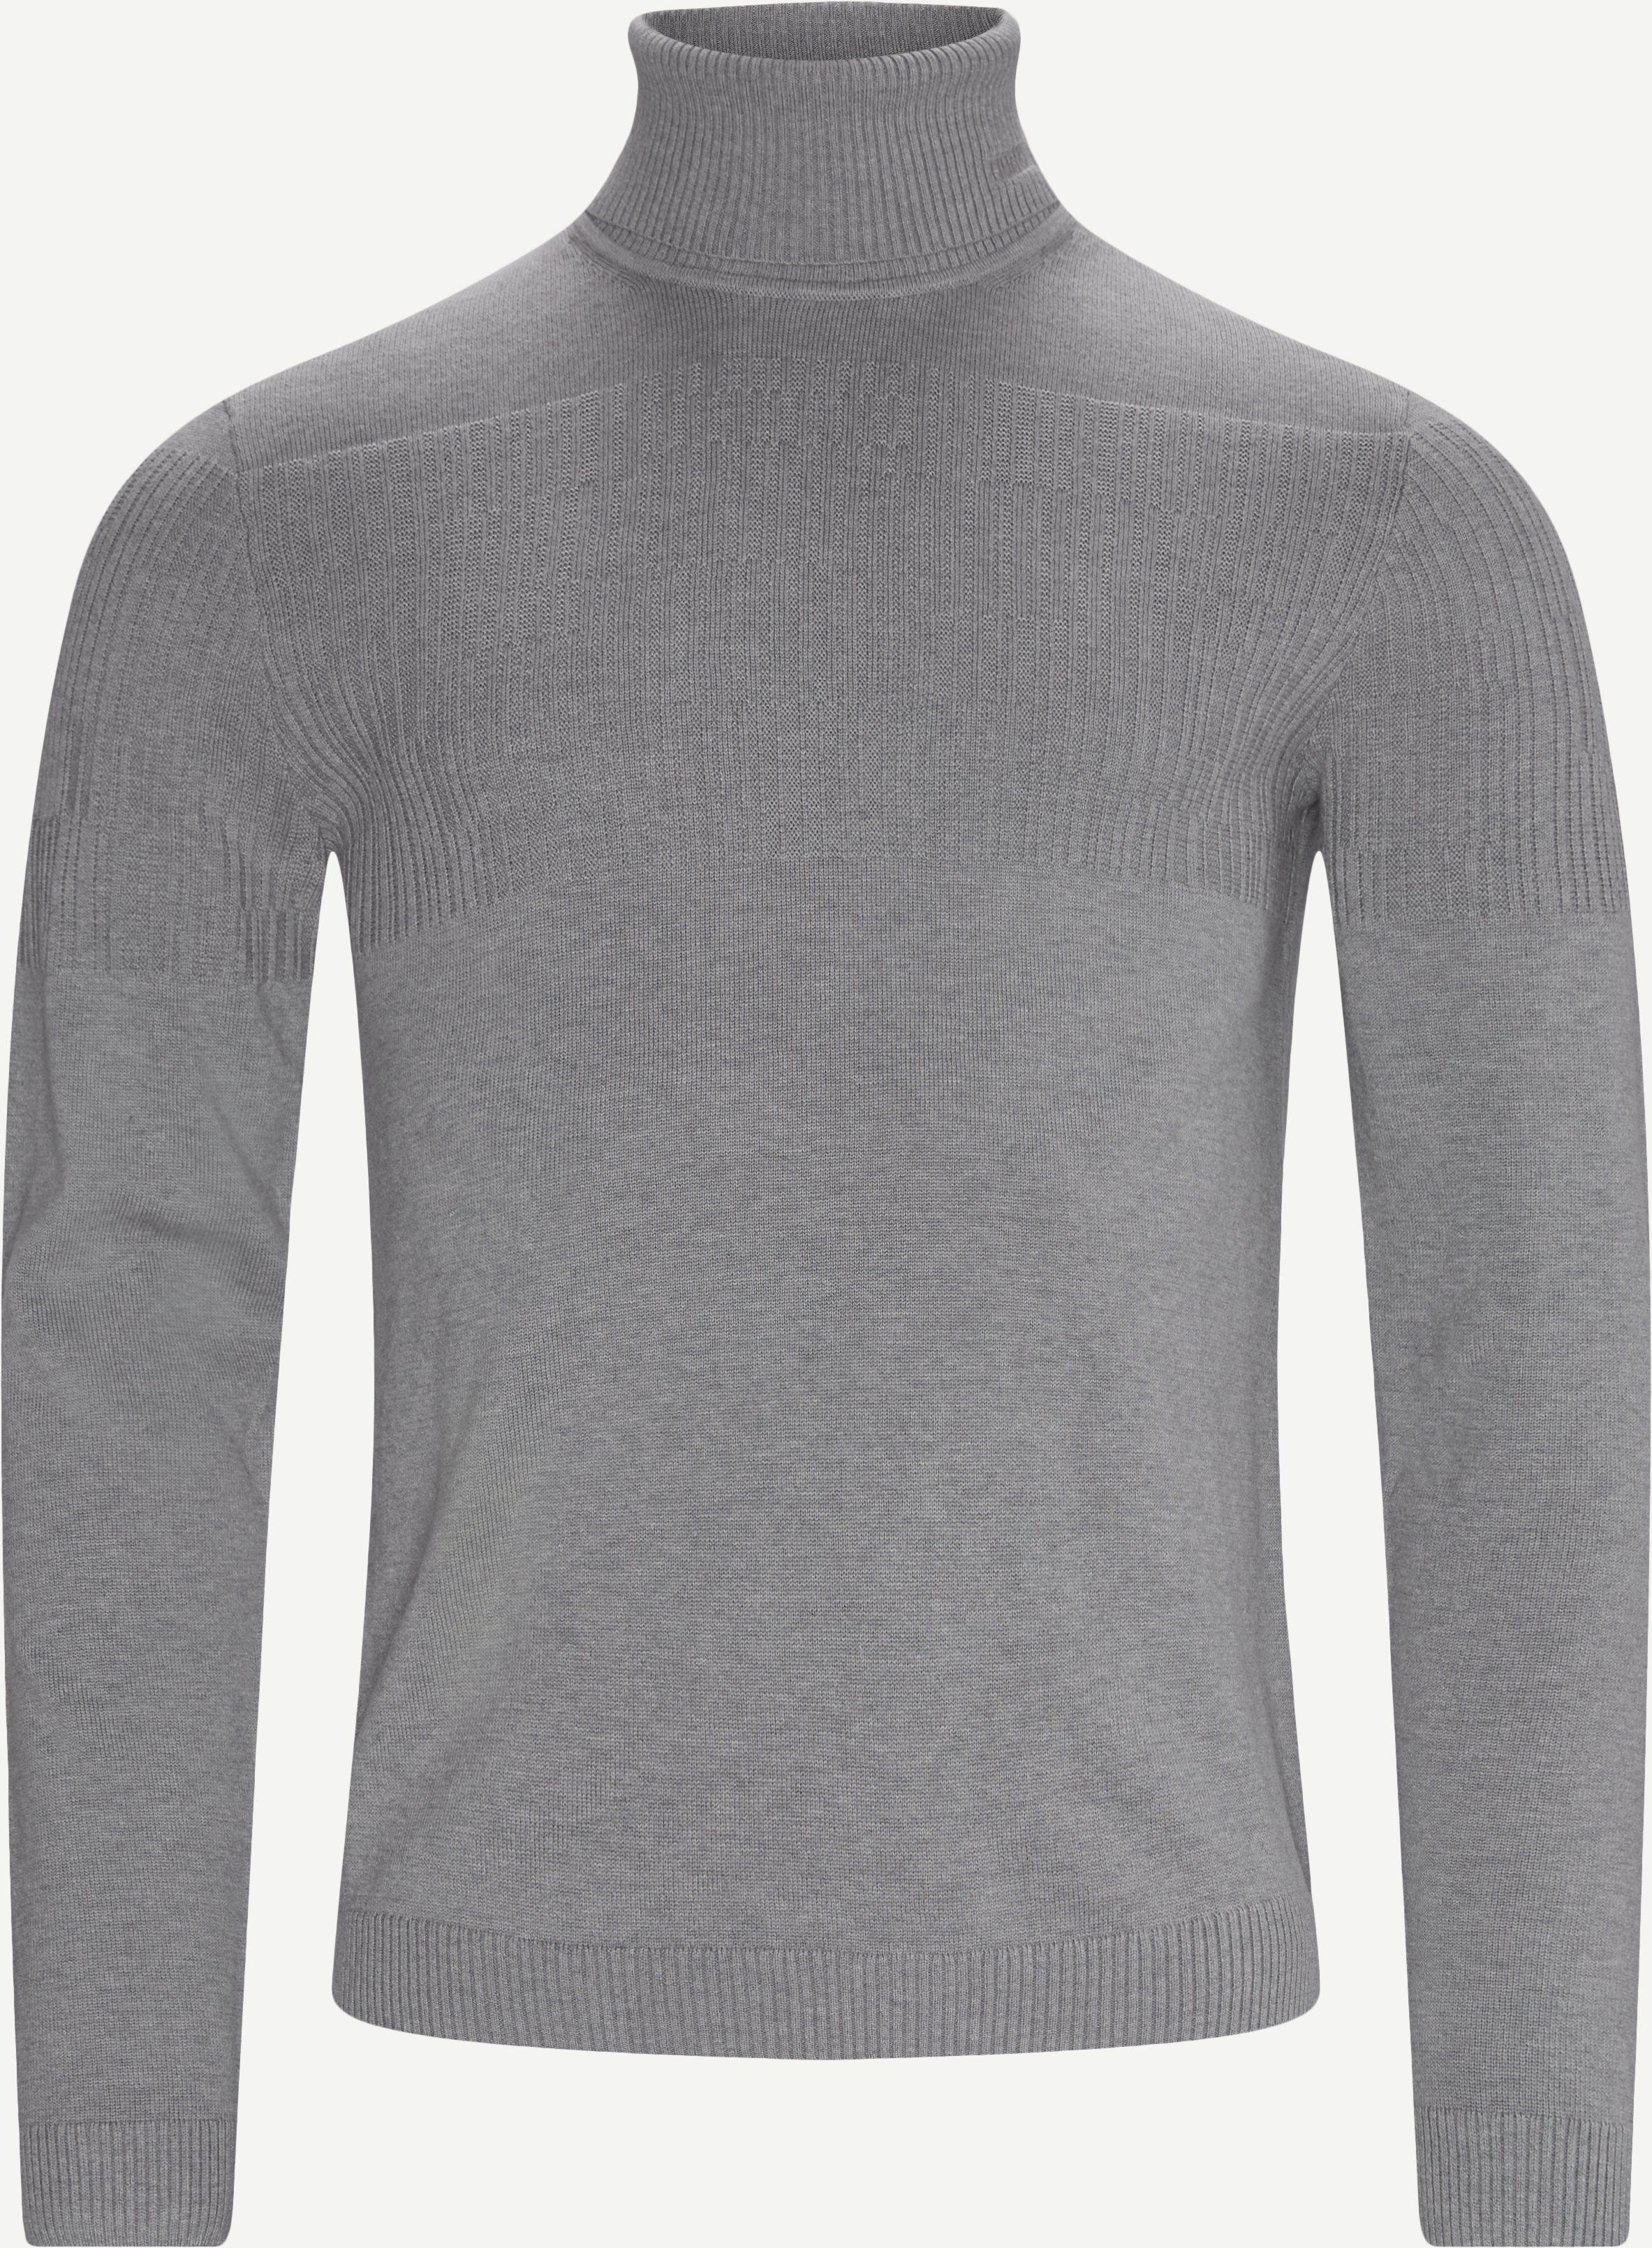 Siseon Rollneck Sweater - Stickat - Slim - Grå